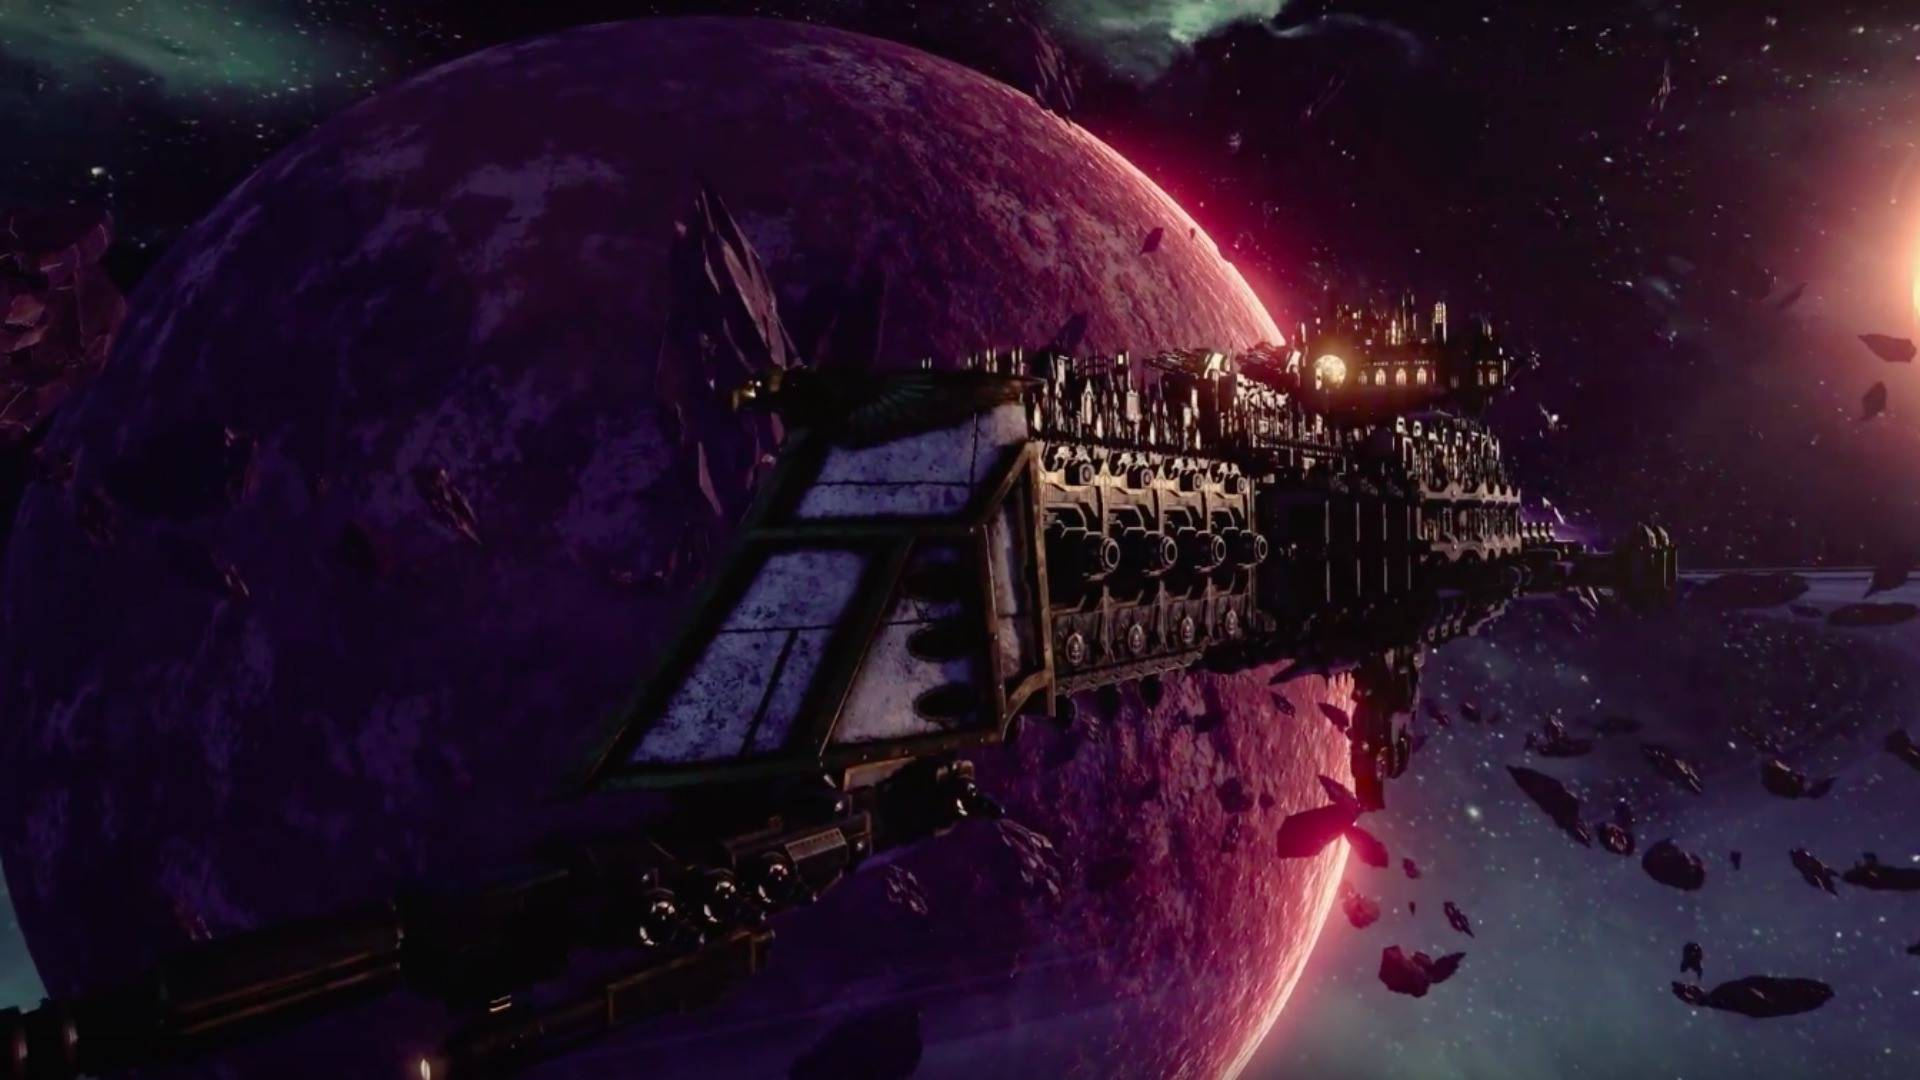 Battlefleet Gothic: Armada Widescreen for desktop